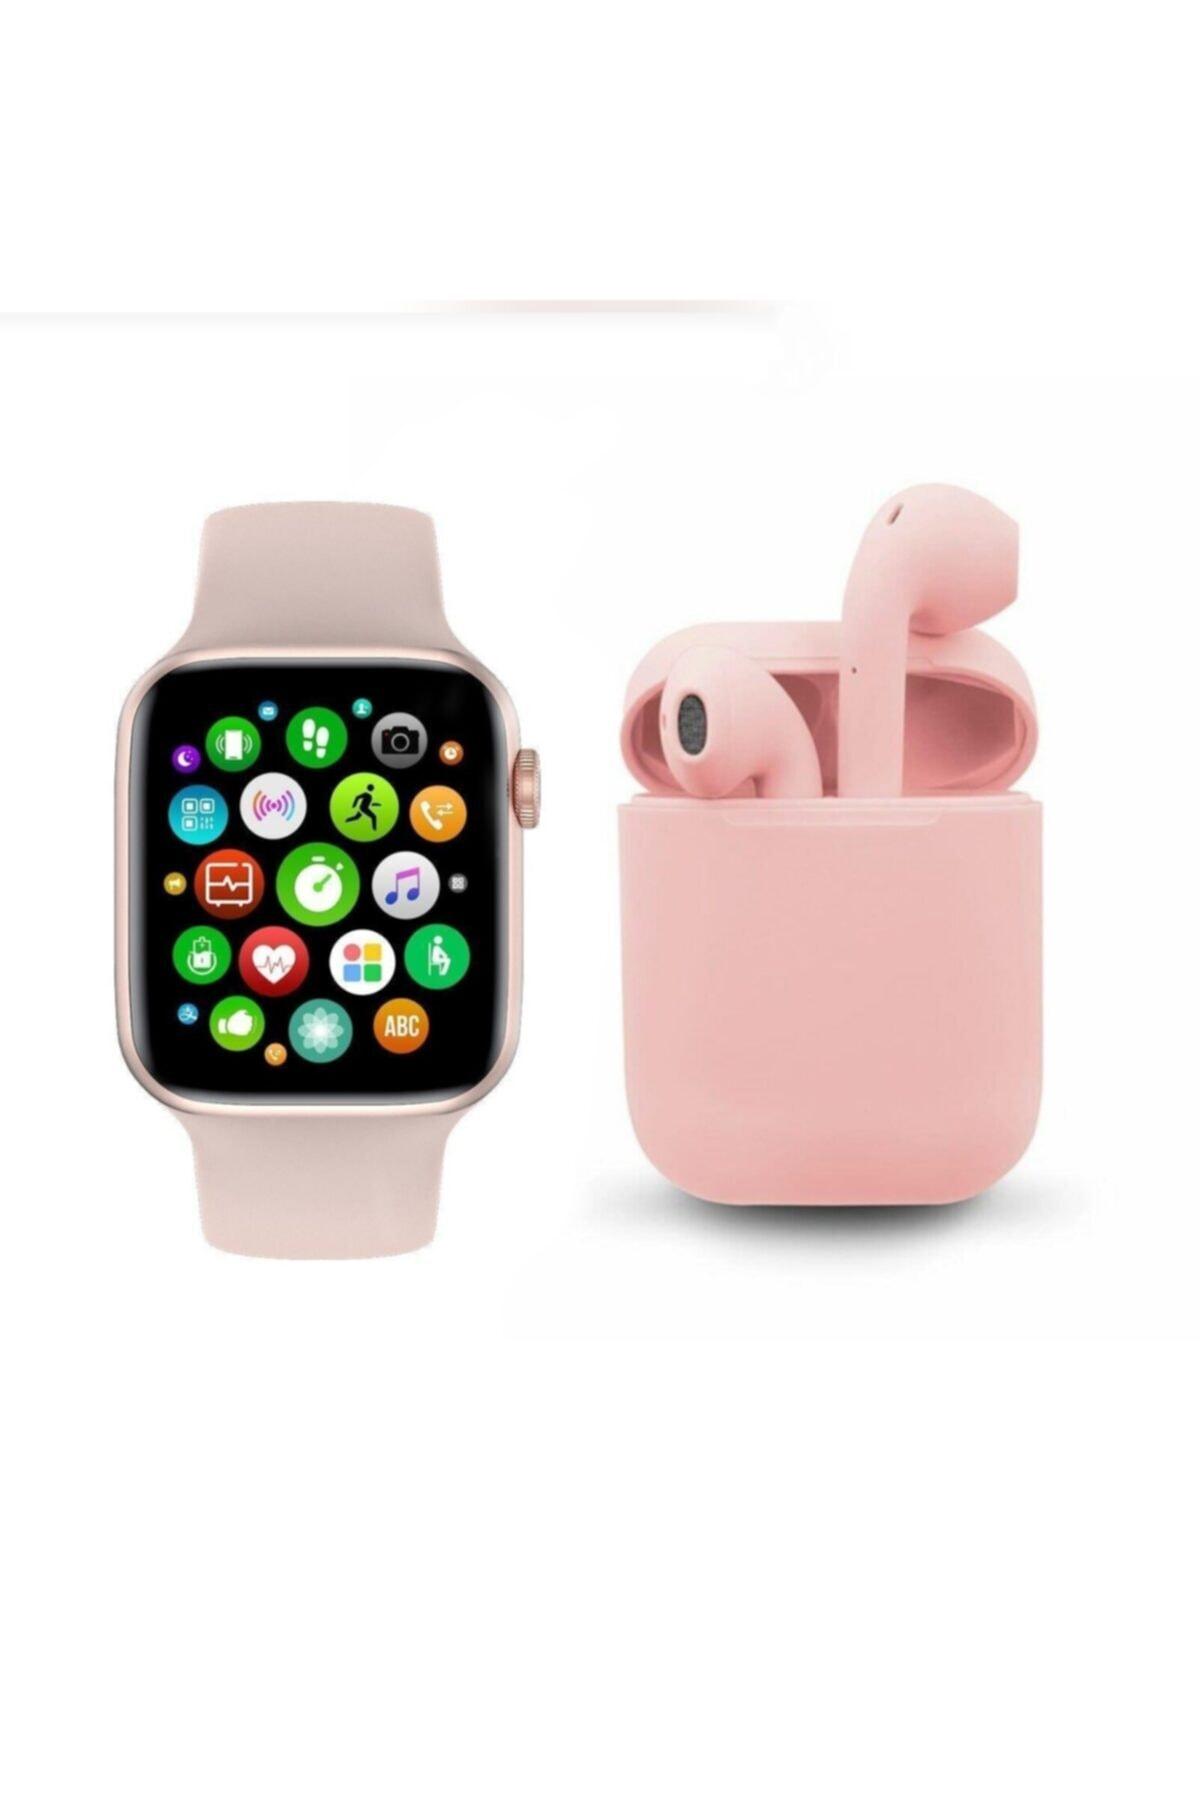 FERRO Watch 6 Plus Enson Seri 2021 Bluetooth Kulaklık Hediyeli Android Ve Ios Uyumlu 1